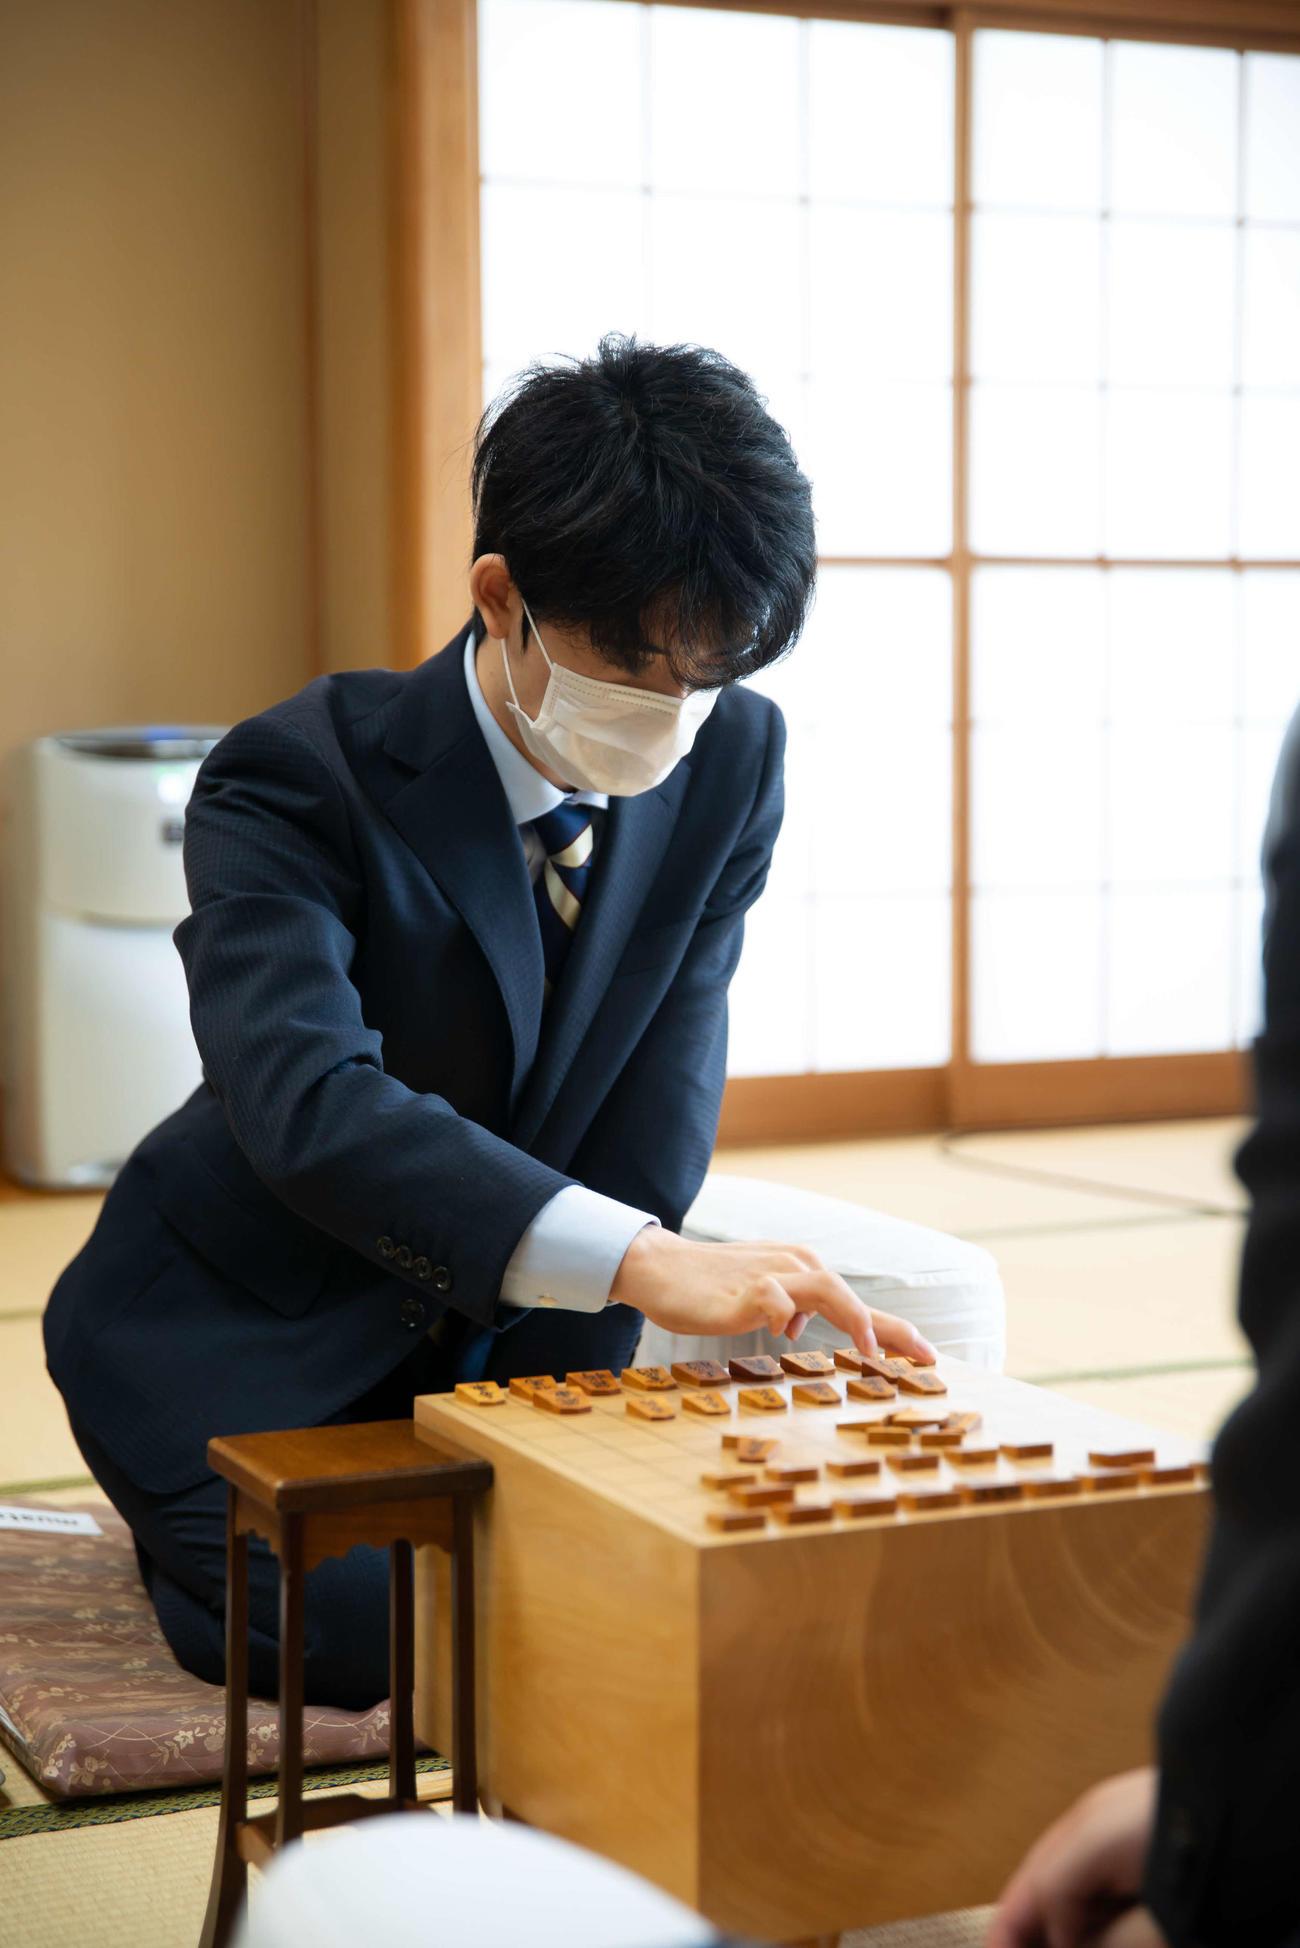 第61期王位戦挑戦者決定戦に臨んだ藤井聡太七段(日本将棋連盟提供)